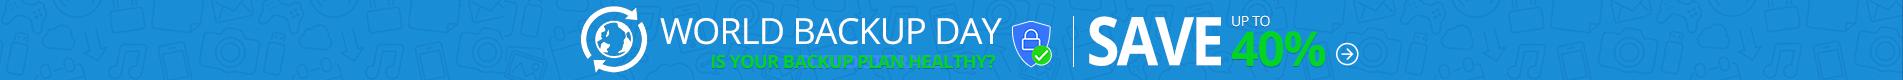 World-Backup-Day-2021-Banner